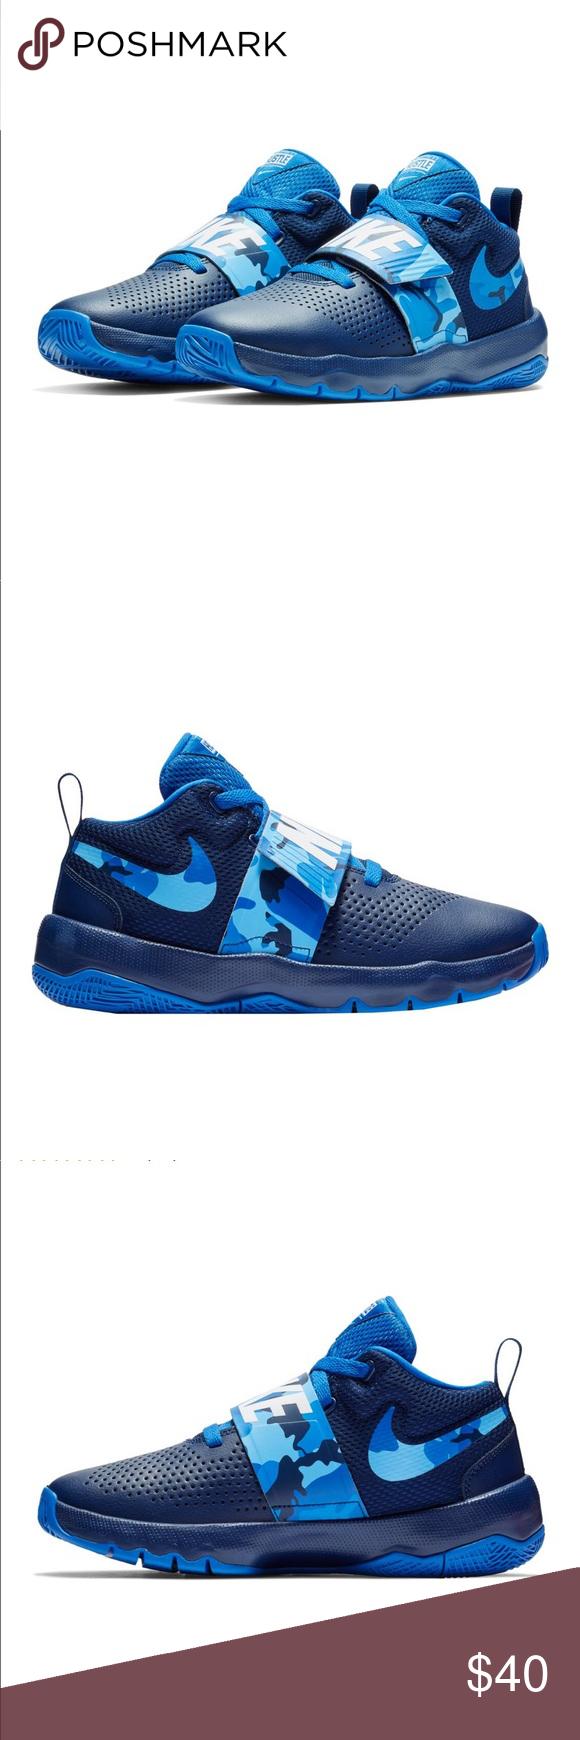 NEW Nike Kids Team Hustle D8 Camo